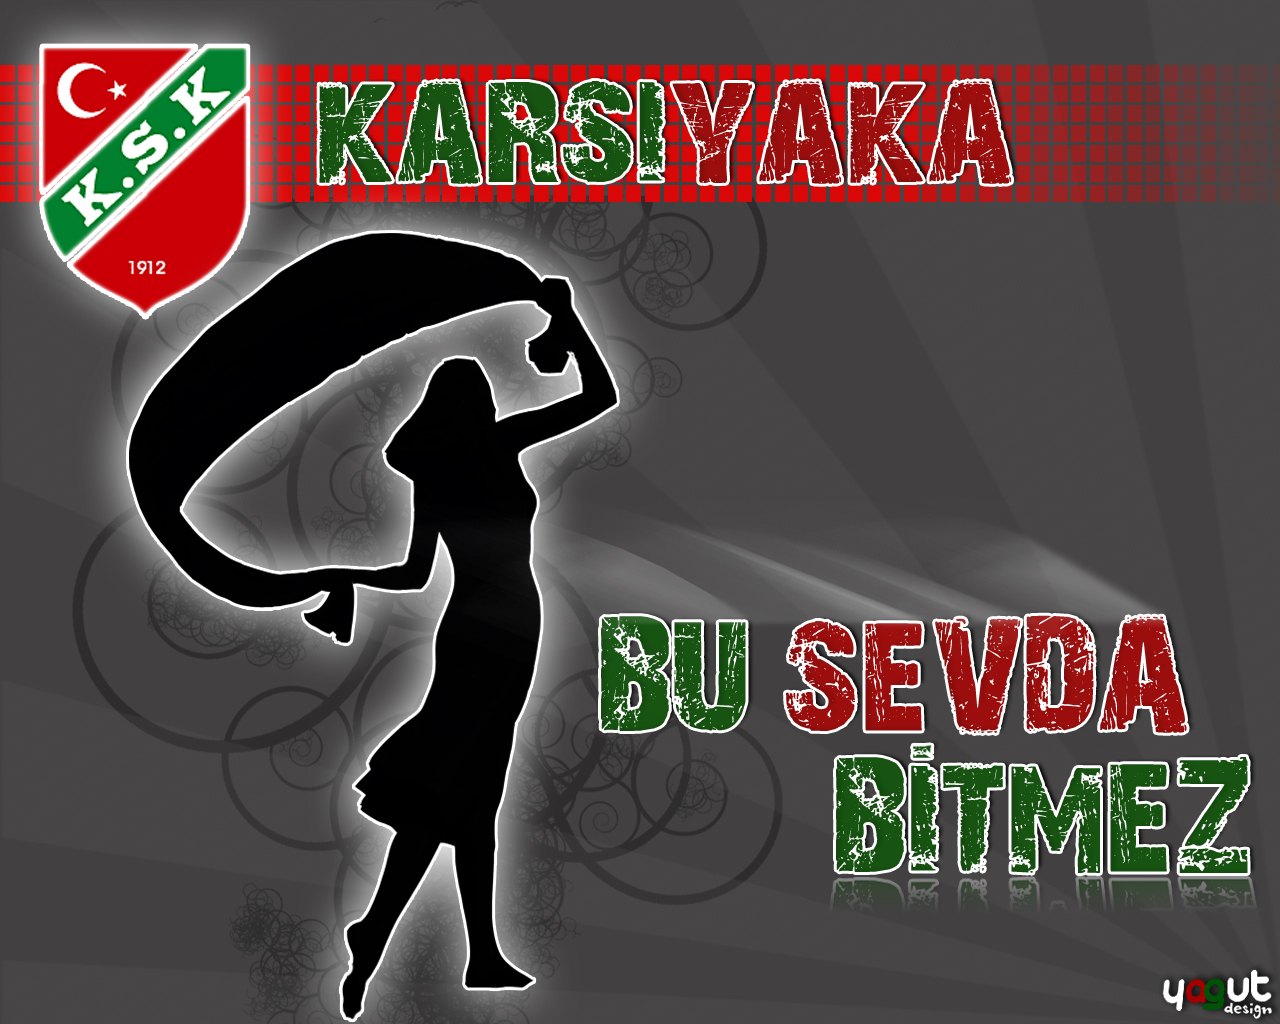 http://4.bp.blogspot.com/_Z-trxJX8Mis/TNVy-0DzS1I/AAAAAAAAAFI/FdZov2Ho4Gc/s1600/Karsiyaka-Wallpaper-cpl.jpg